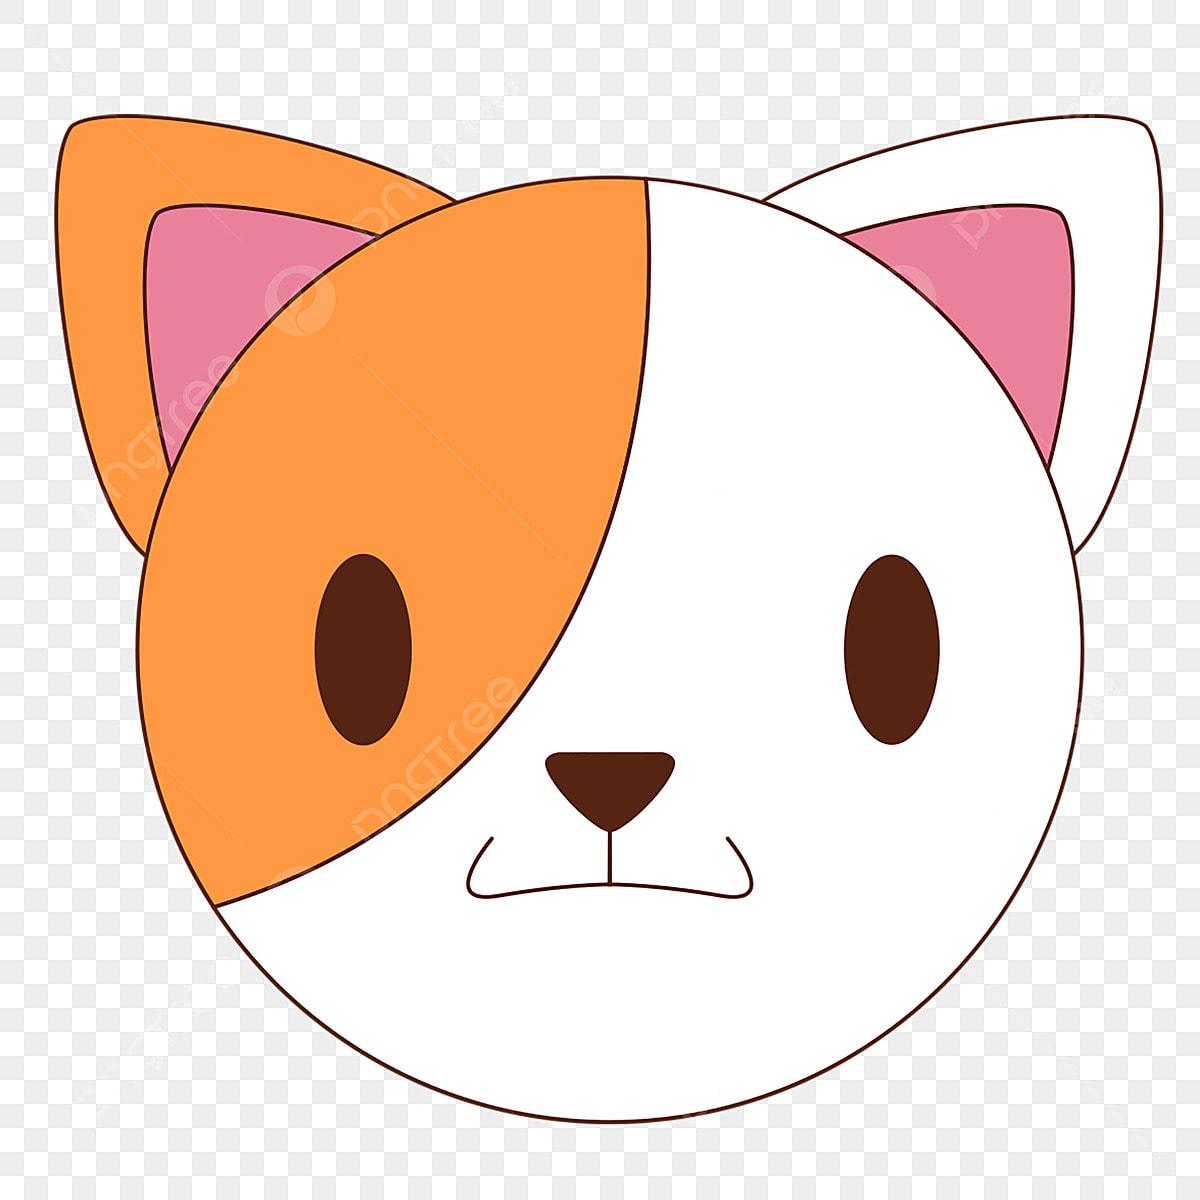 Kartun Hewan Avatar Kucing Bunga Avatar Kucing Putih Kartun